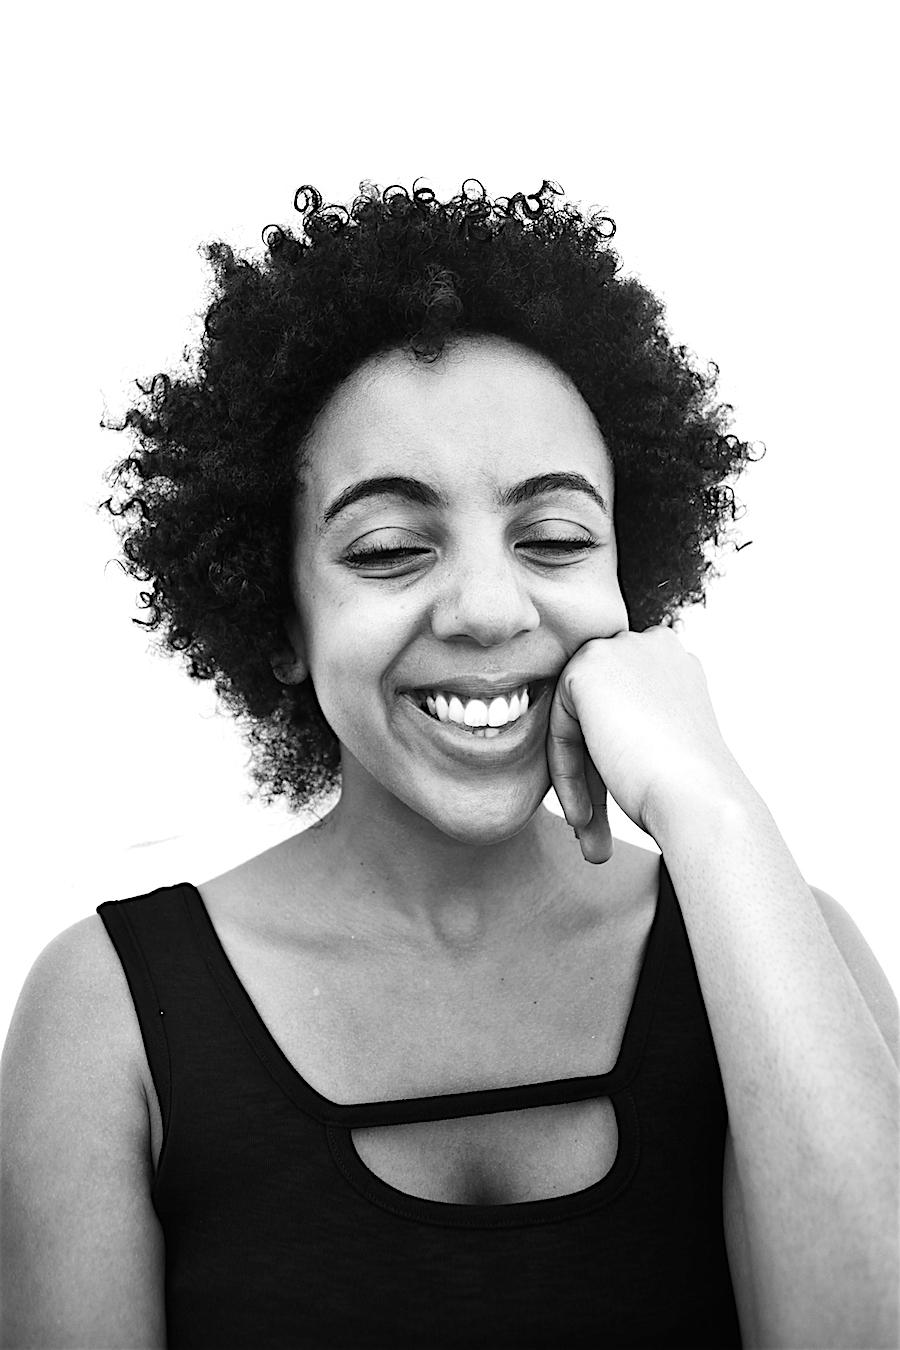 Buhle Ngaba, The Girl Without a Sound, South Africa Literature, KOLUMN Magazine, KOLUMN